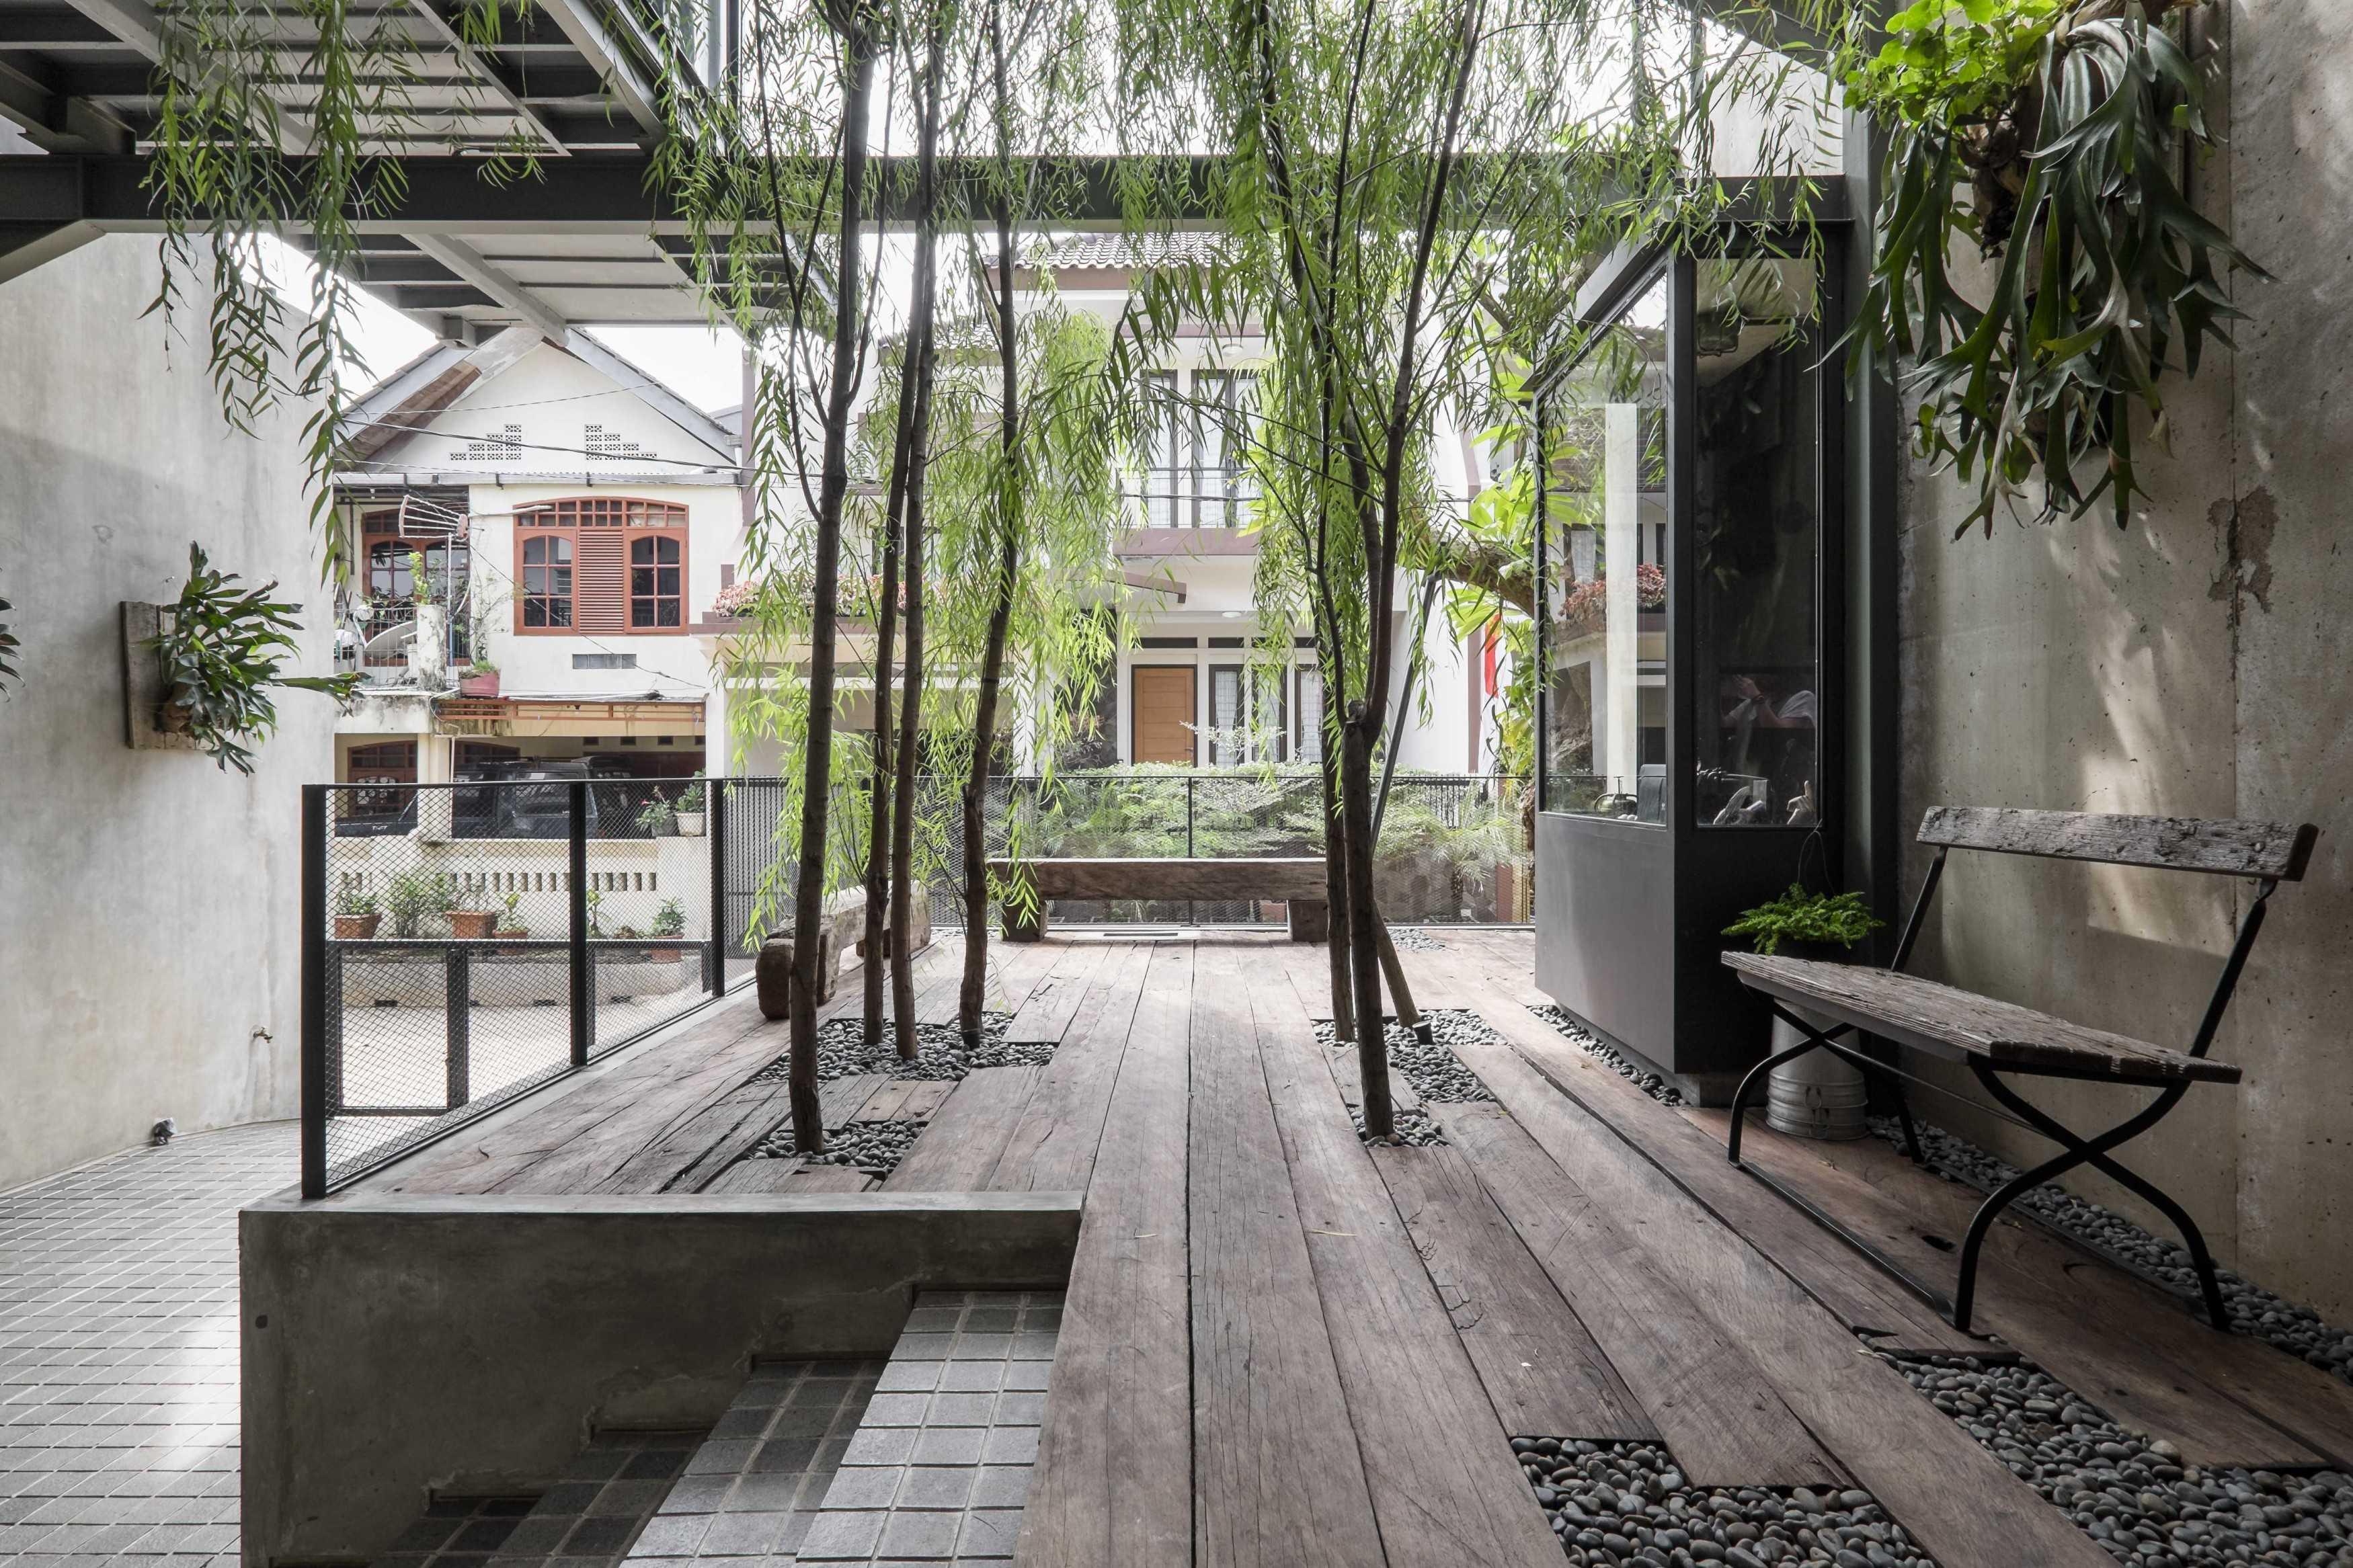 Bitte Design Studio Aa Residence Cimanggis, Indonesia Cimanggis, Indonesia Terrace   23127